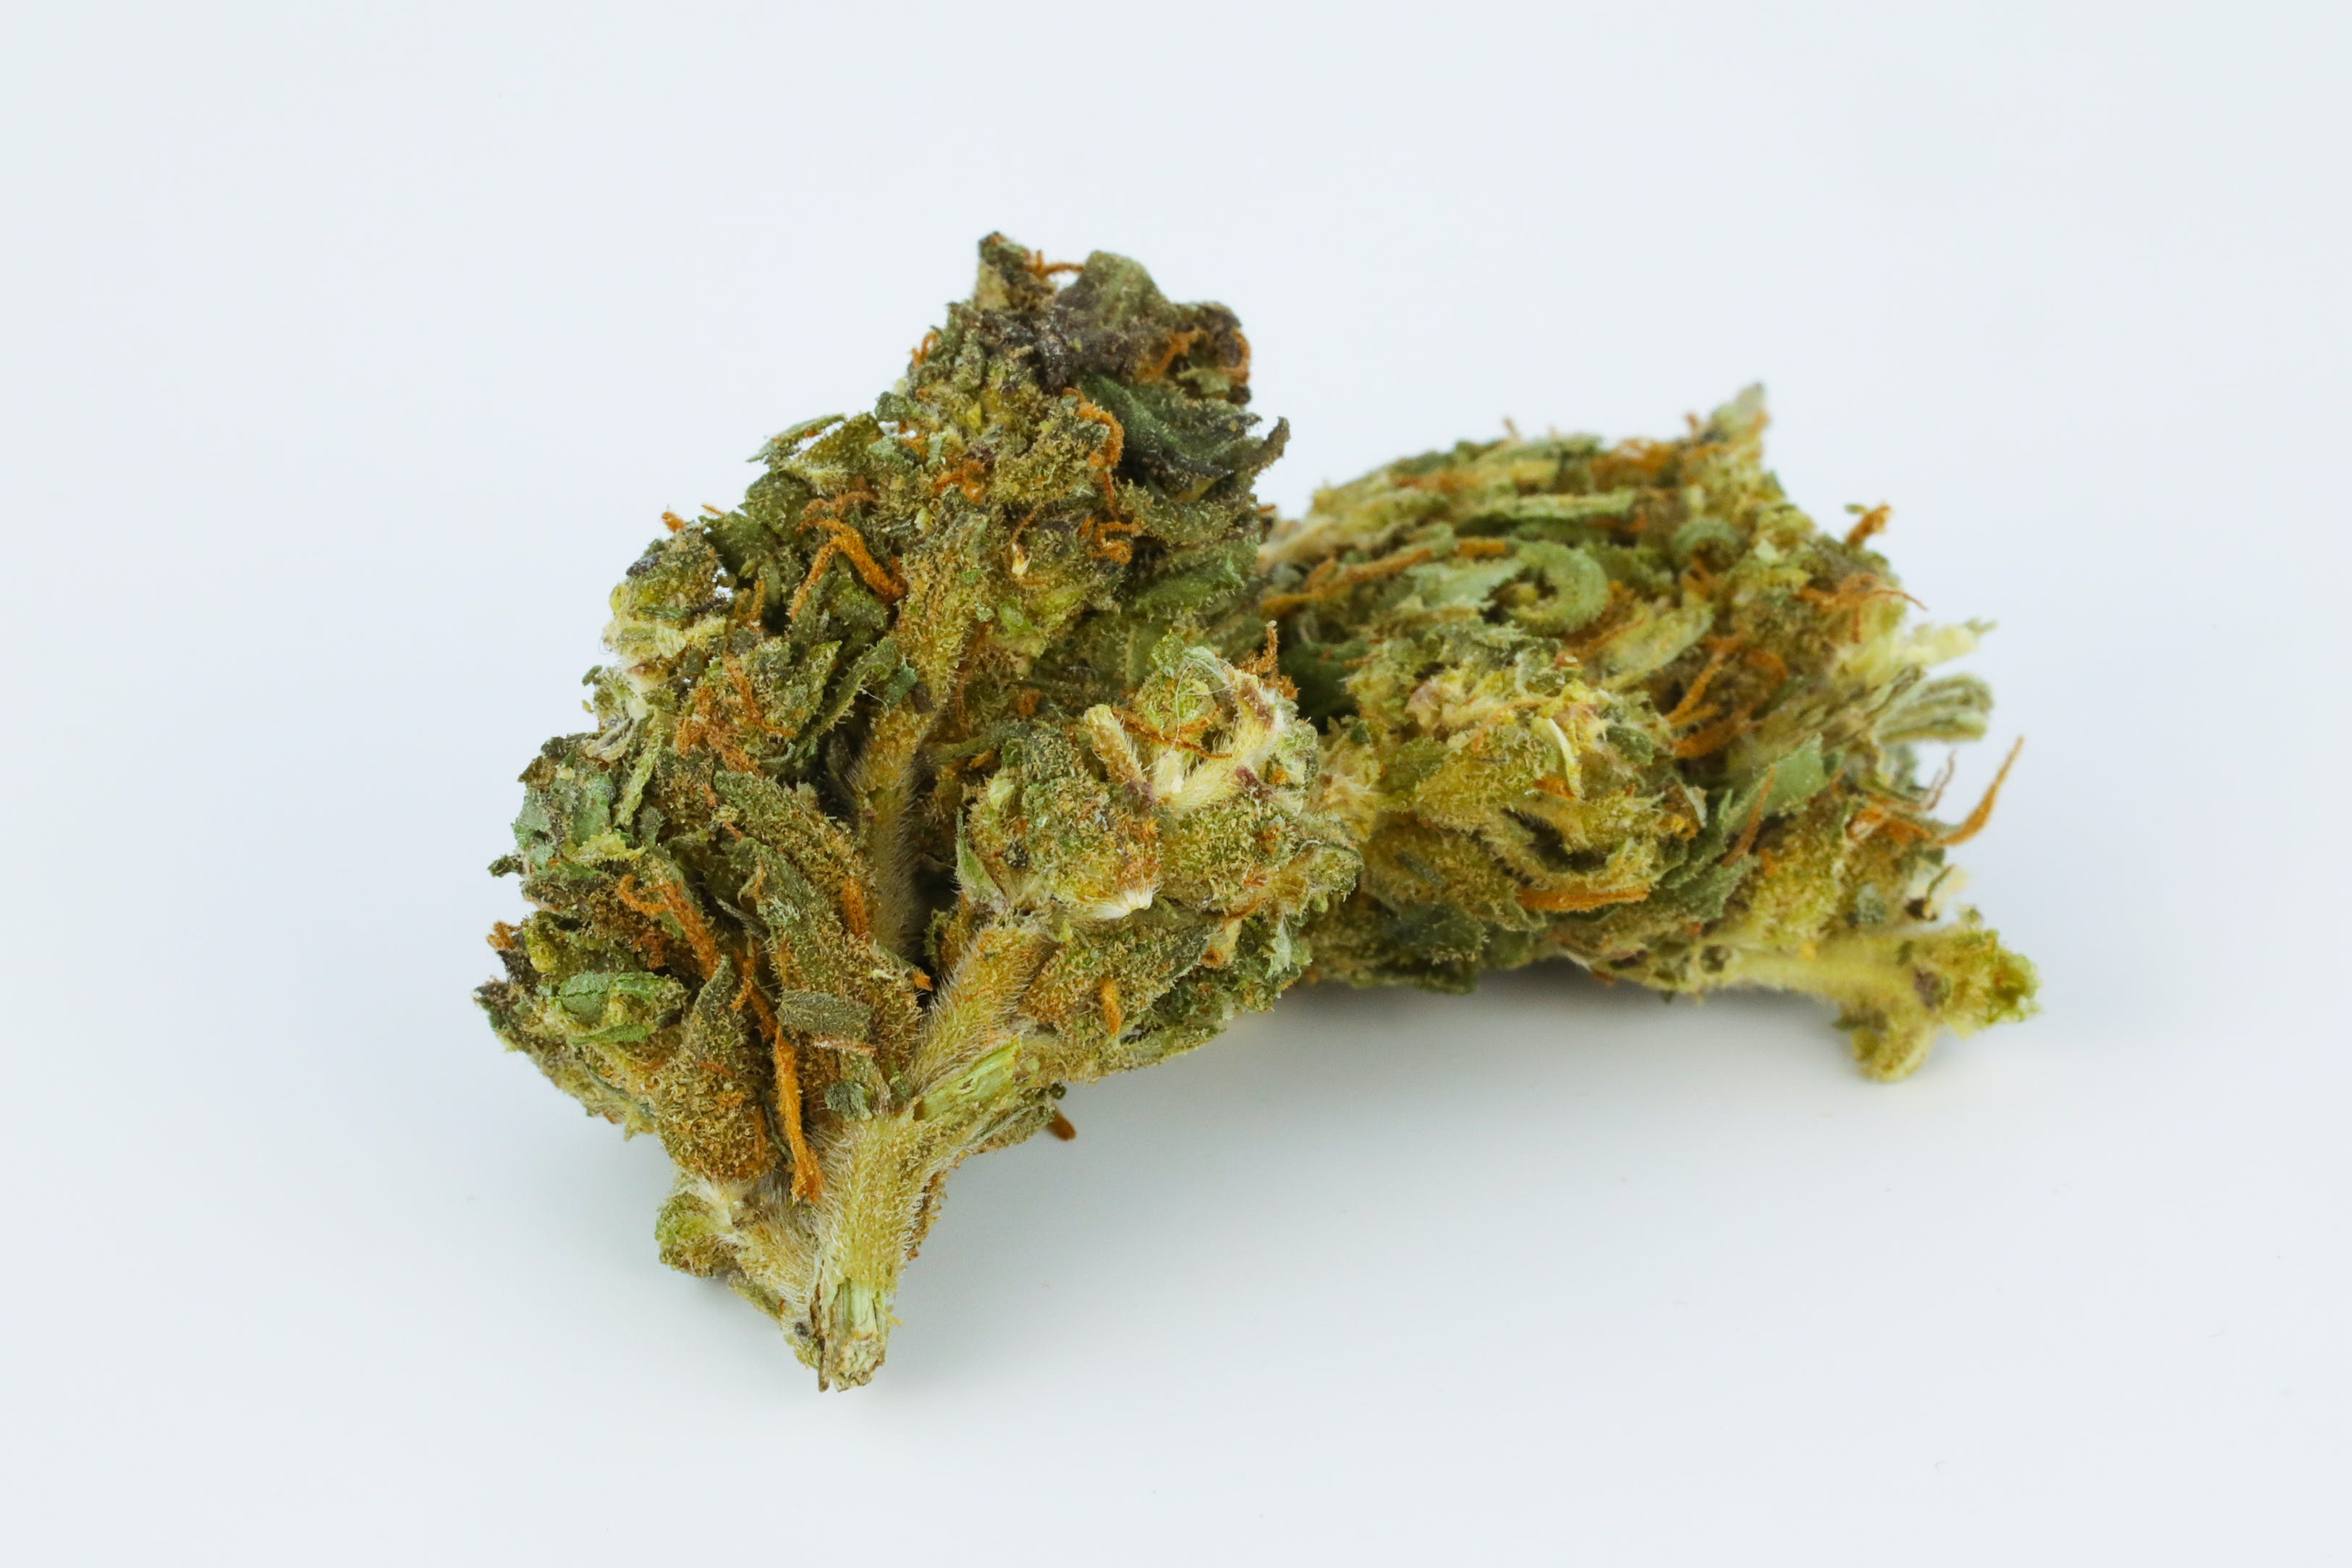 Haley's Comet Weed; Haley's Comet Cannabis Strain; Haley's Comet Hybrid Marijuana Strain